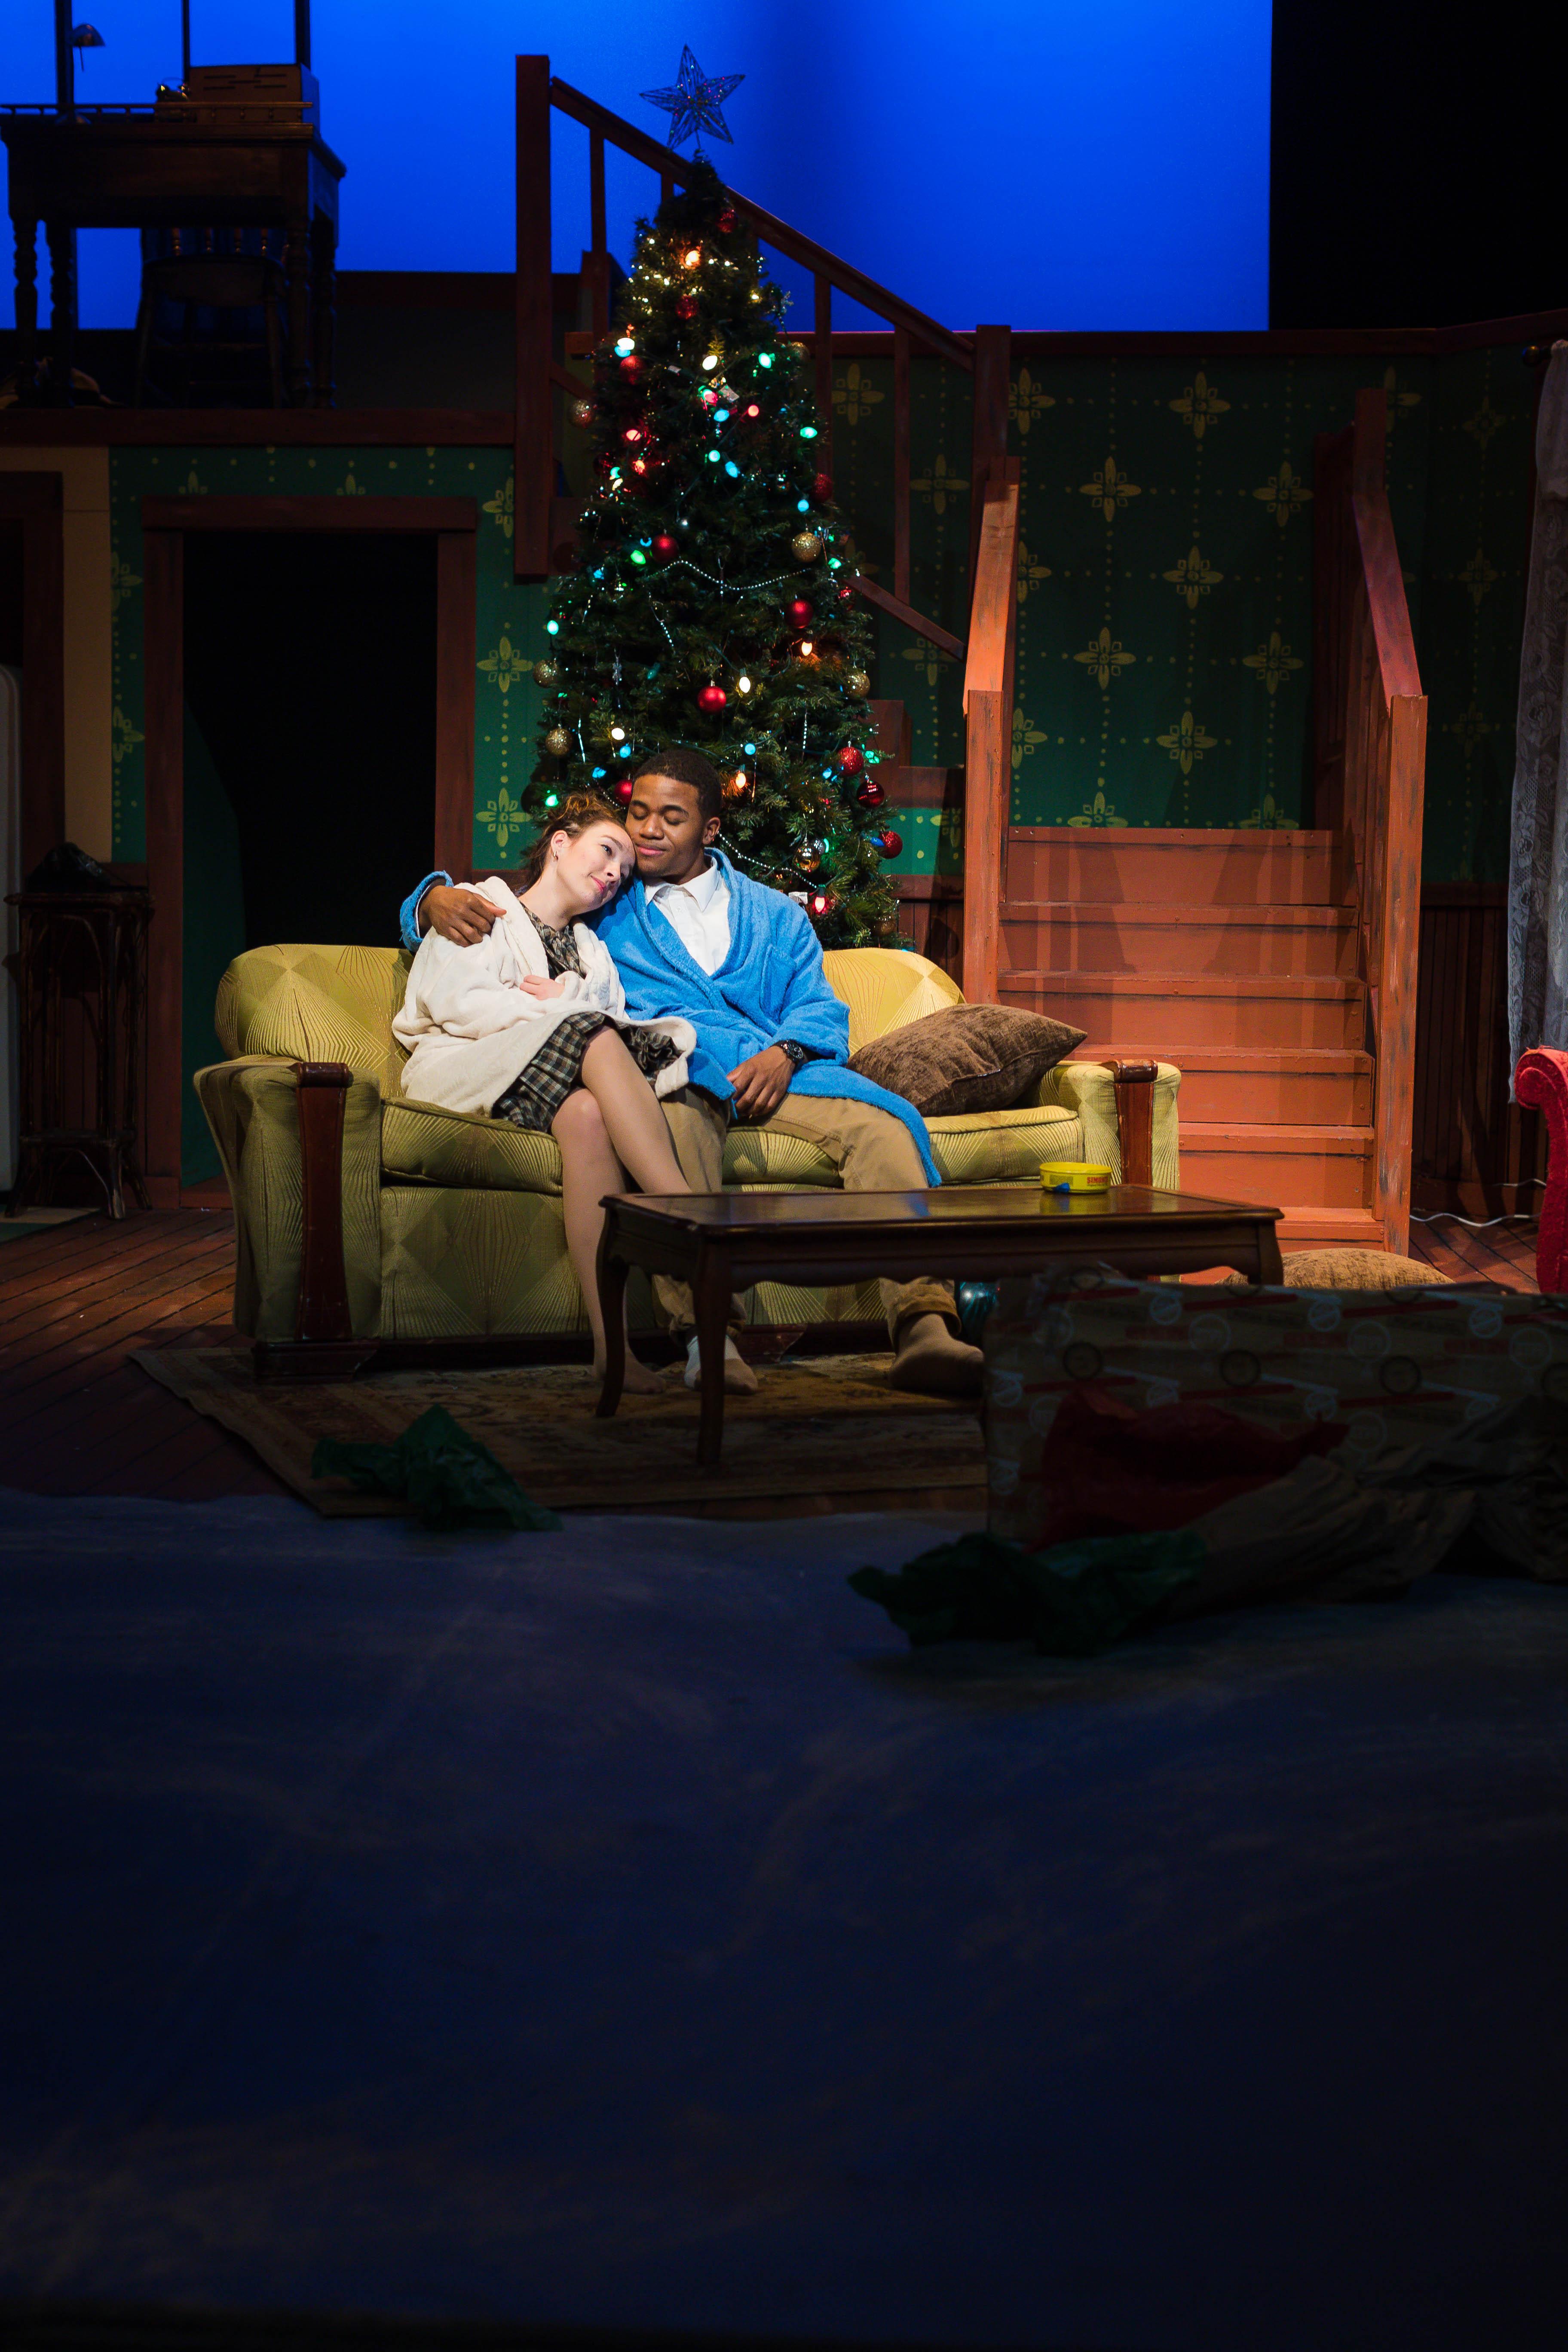 Weaver_Christmasshoot-_MG_1656